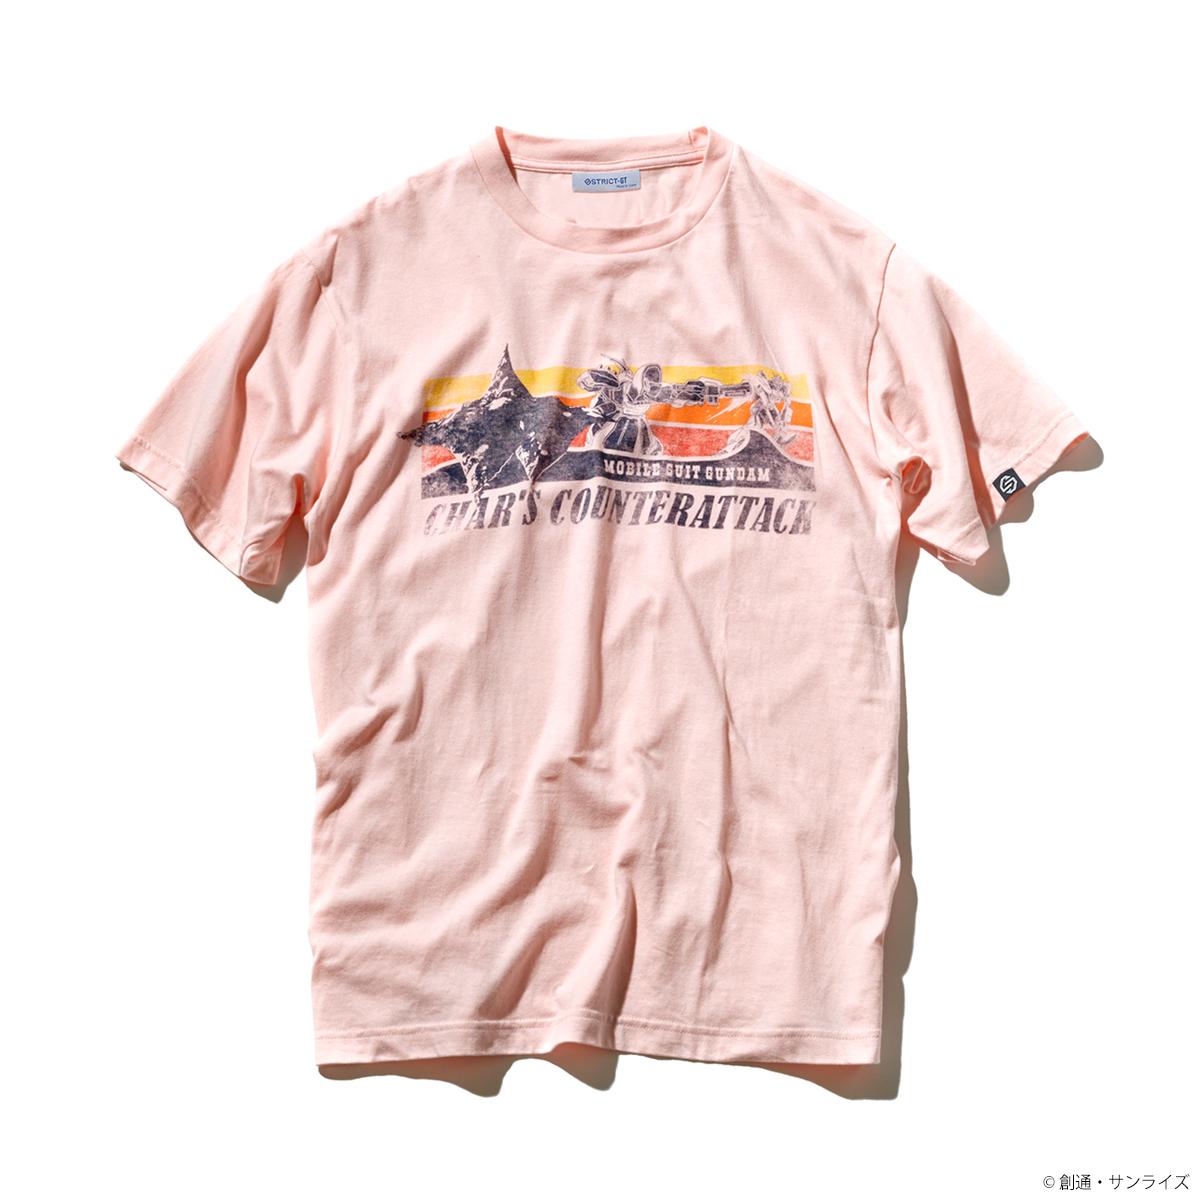 STRICT-G『機動戦士ガンダム 逆襲のシャア』 サーフTシャツ AXIS